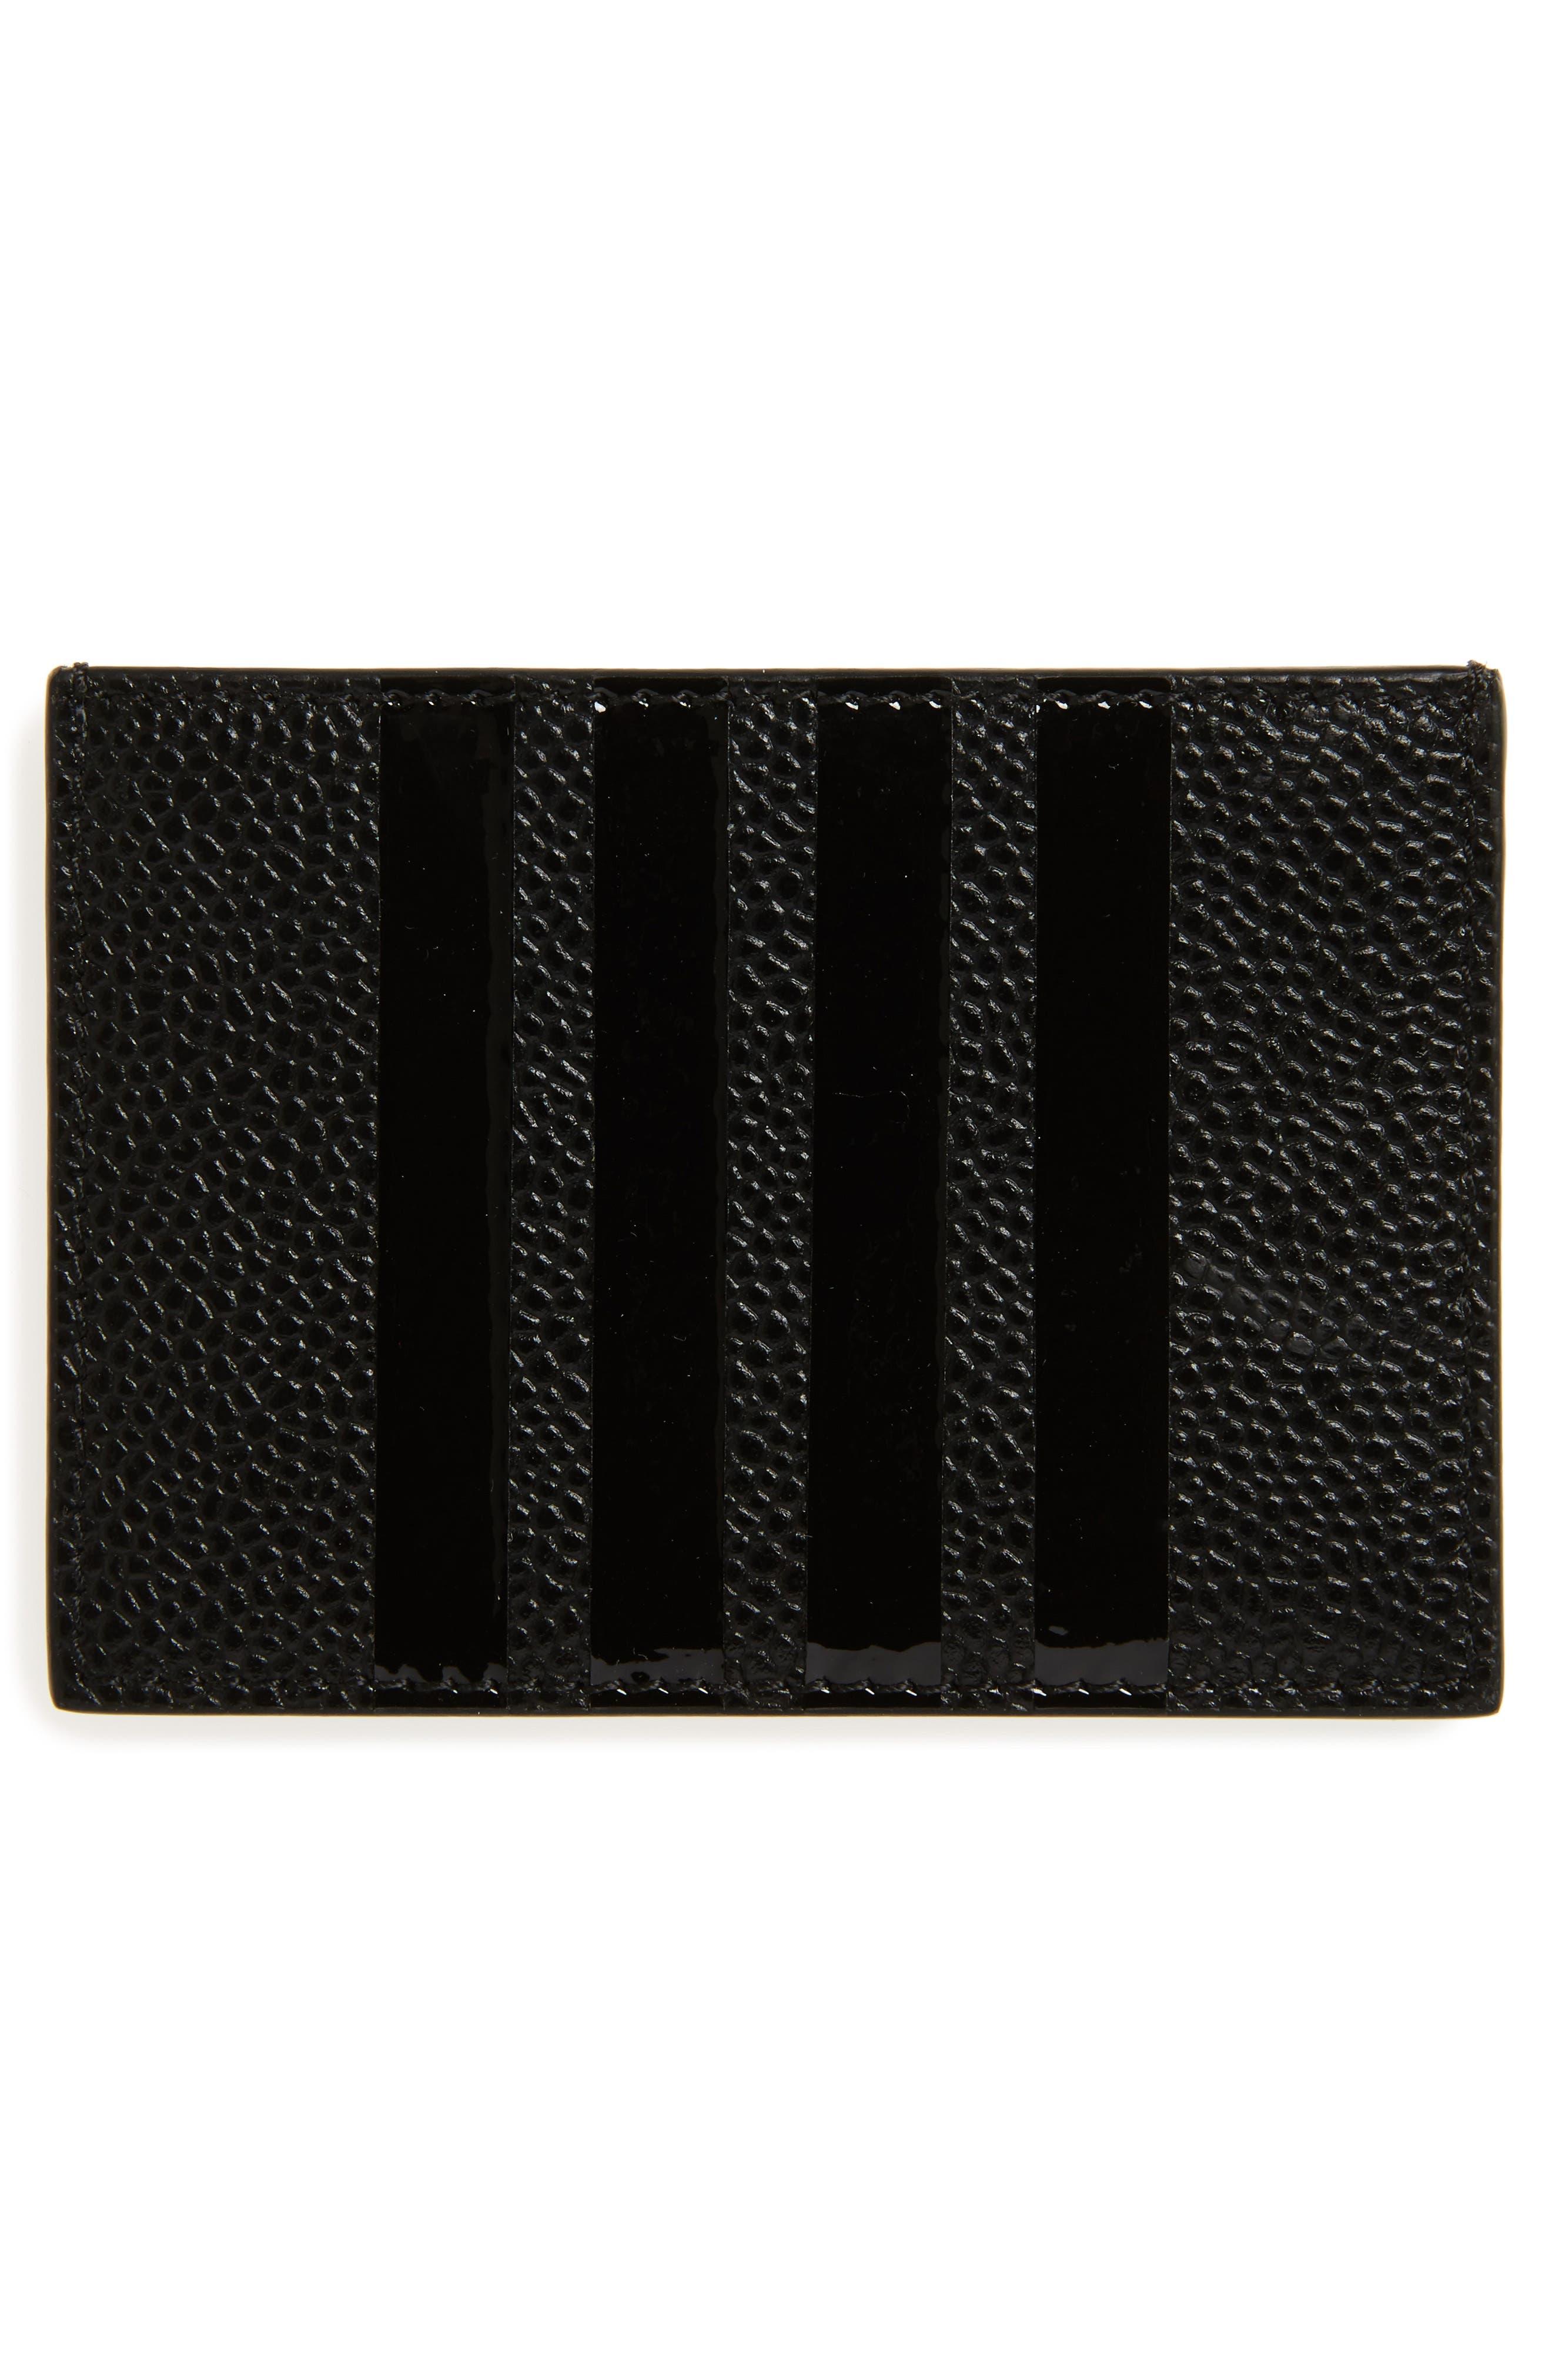 Patent Leather Card Case,                             Alternate thumbnail 2, color,                             Black